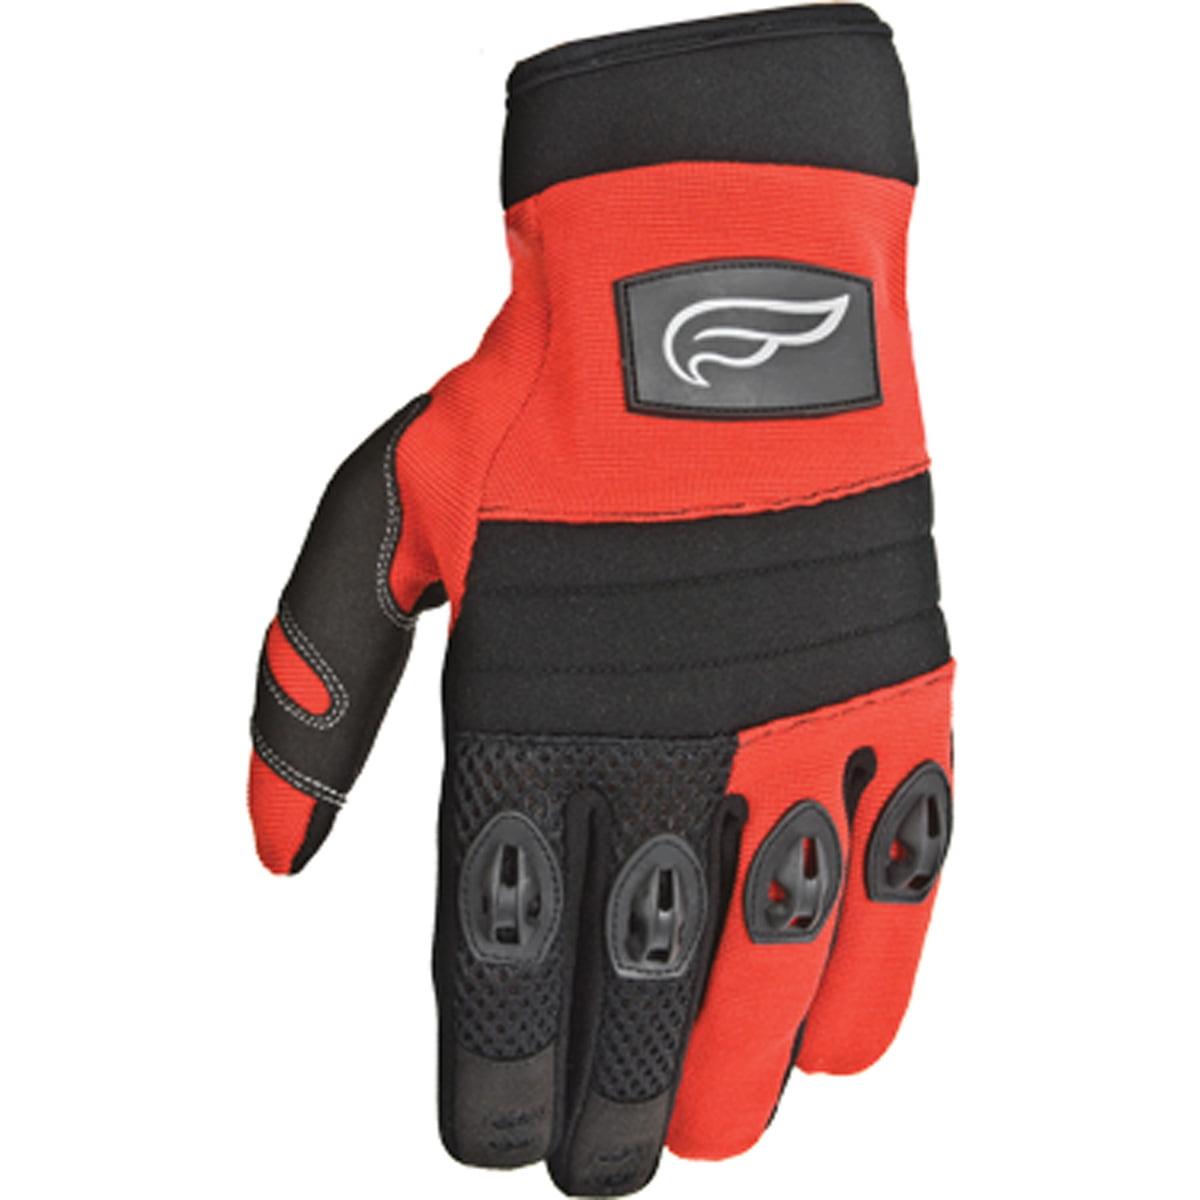 Men's Fulmer GX Cool Glove II Gloves Motorcycle ATV MX Dirt Bike Riding Gloves